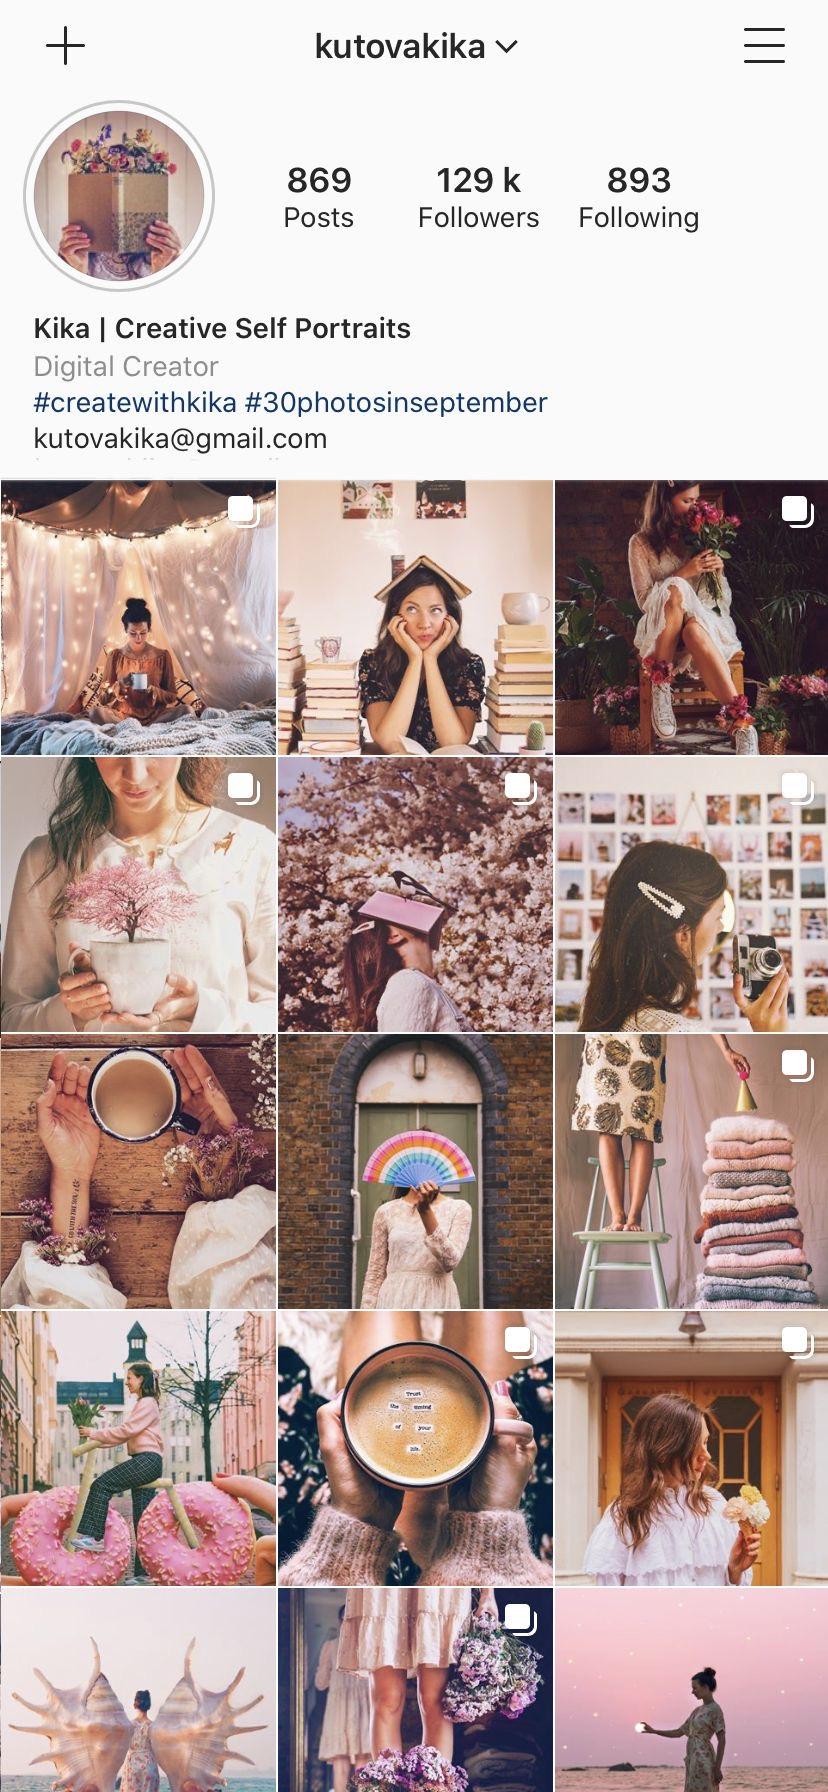 Kutovakika Instagram